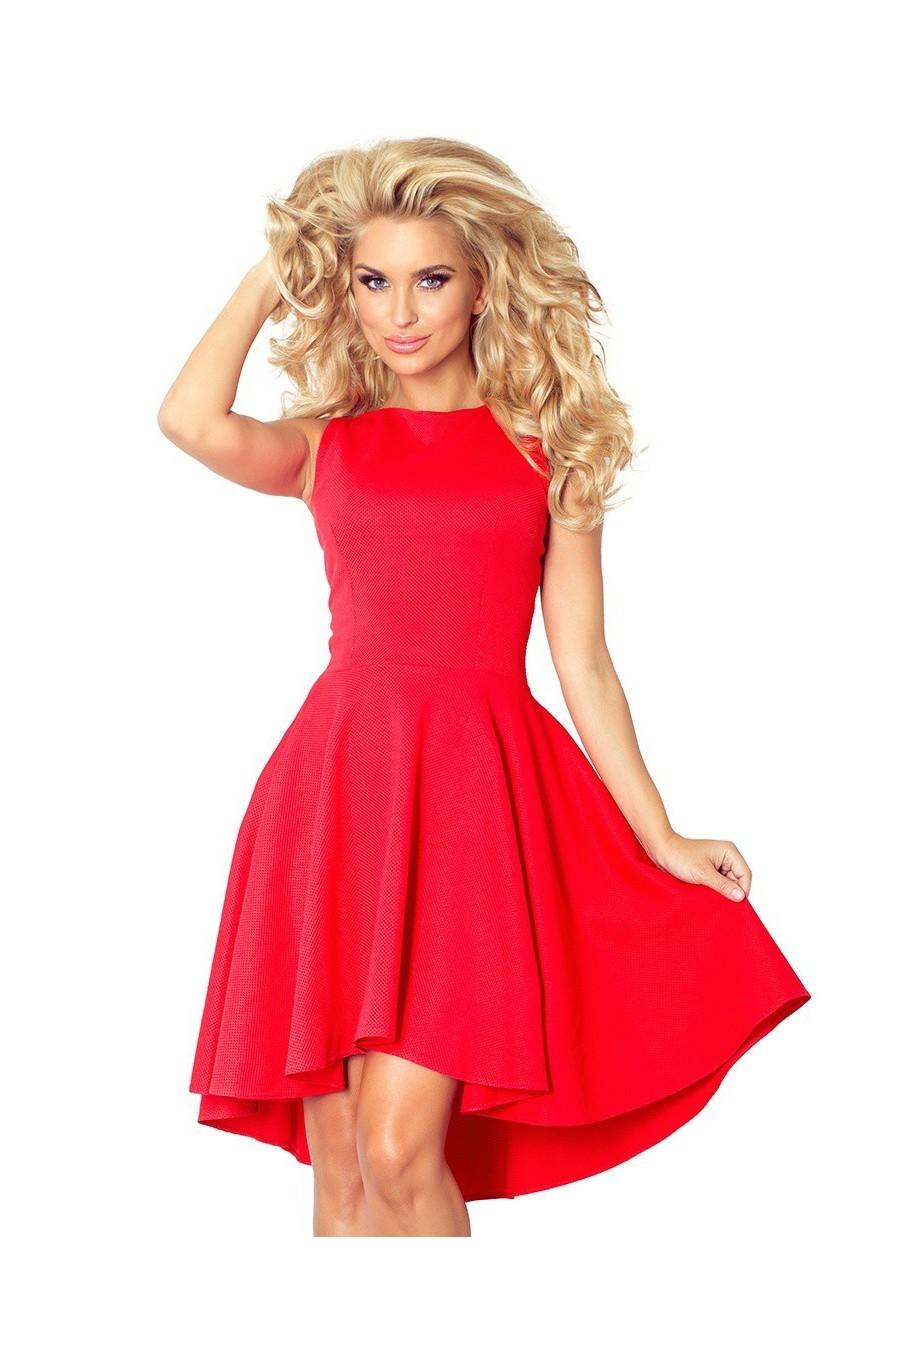 Lacosta - Exclusive asymetrické šaty - cervena 66-12